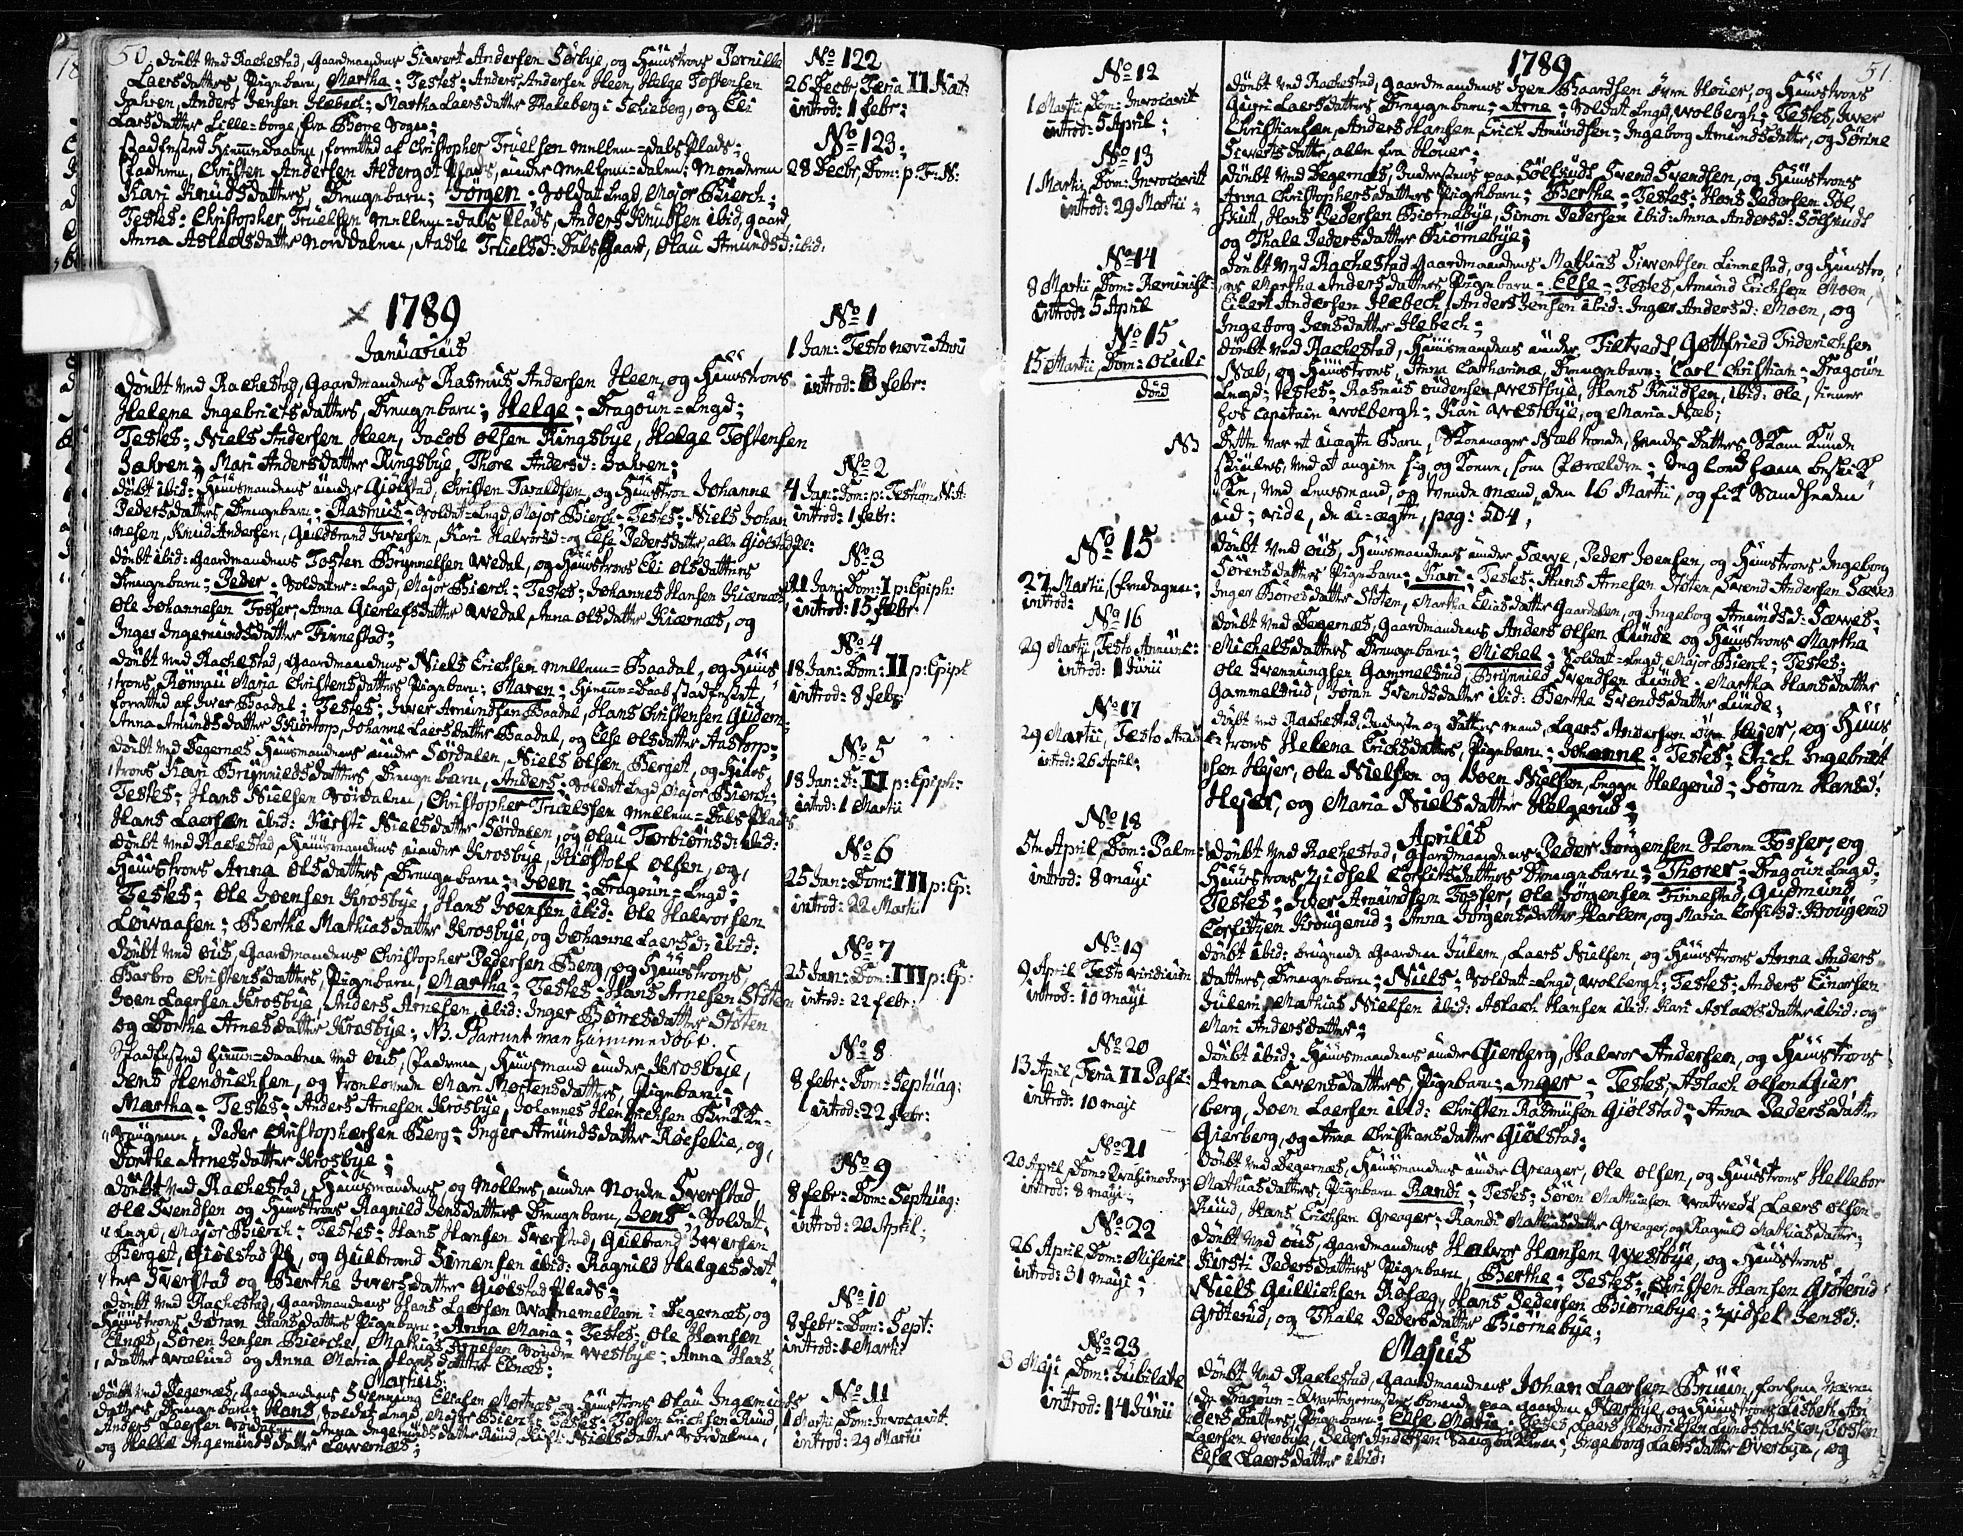 SAO, Rakkestad prestekontor Kirkebøker, F/Fa/L0005: Ministerialbok nr. I 5, 1784-1814, s. 50-51